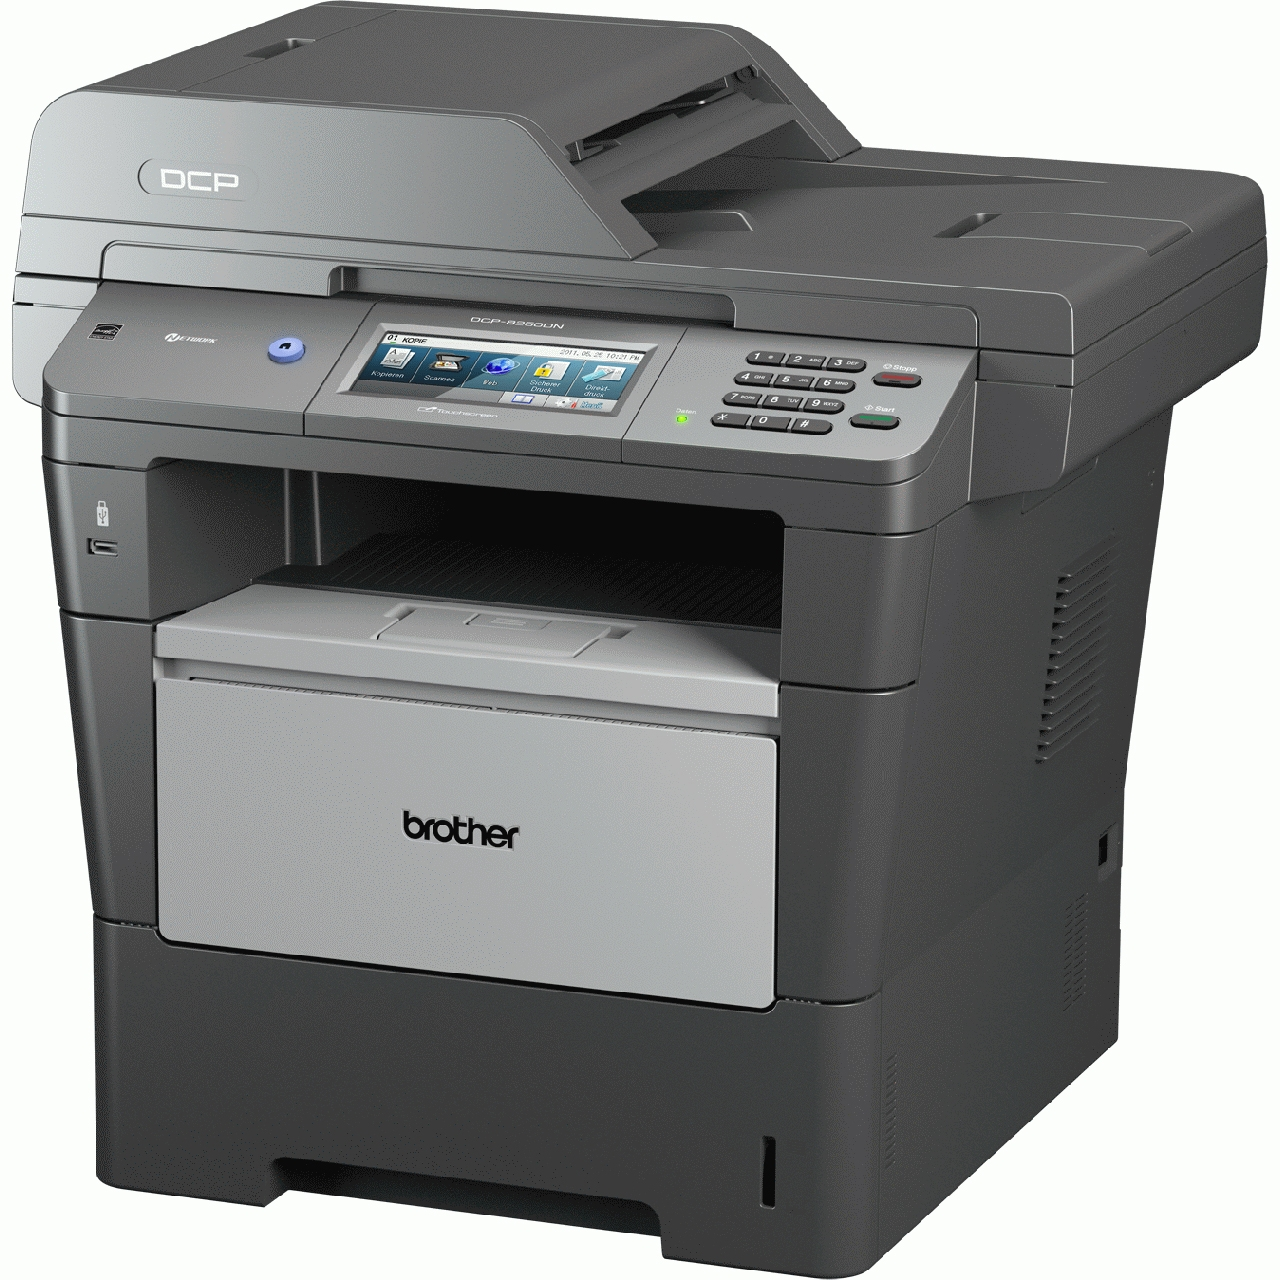 Заправка картриджа Brother TN-3390 для  HL 6180 / DCP 8250 / MFC 8950 со сбросом счетчика